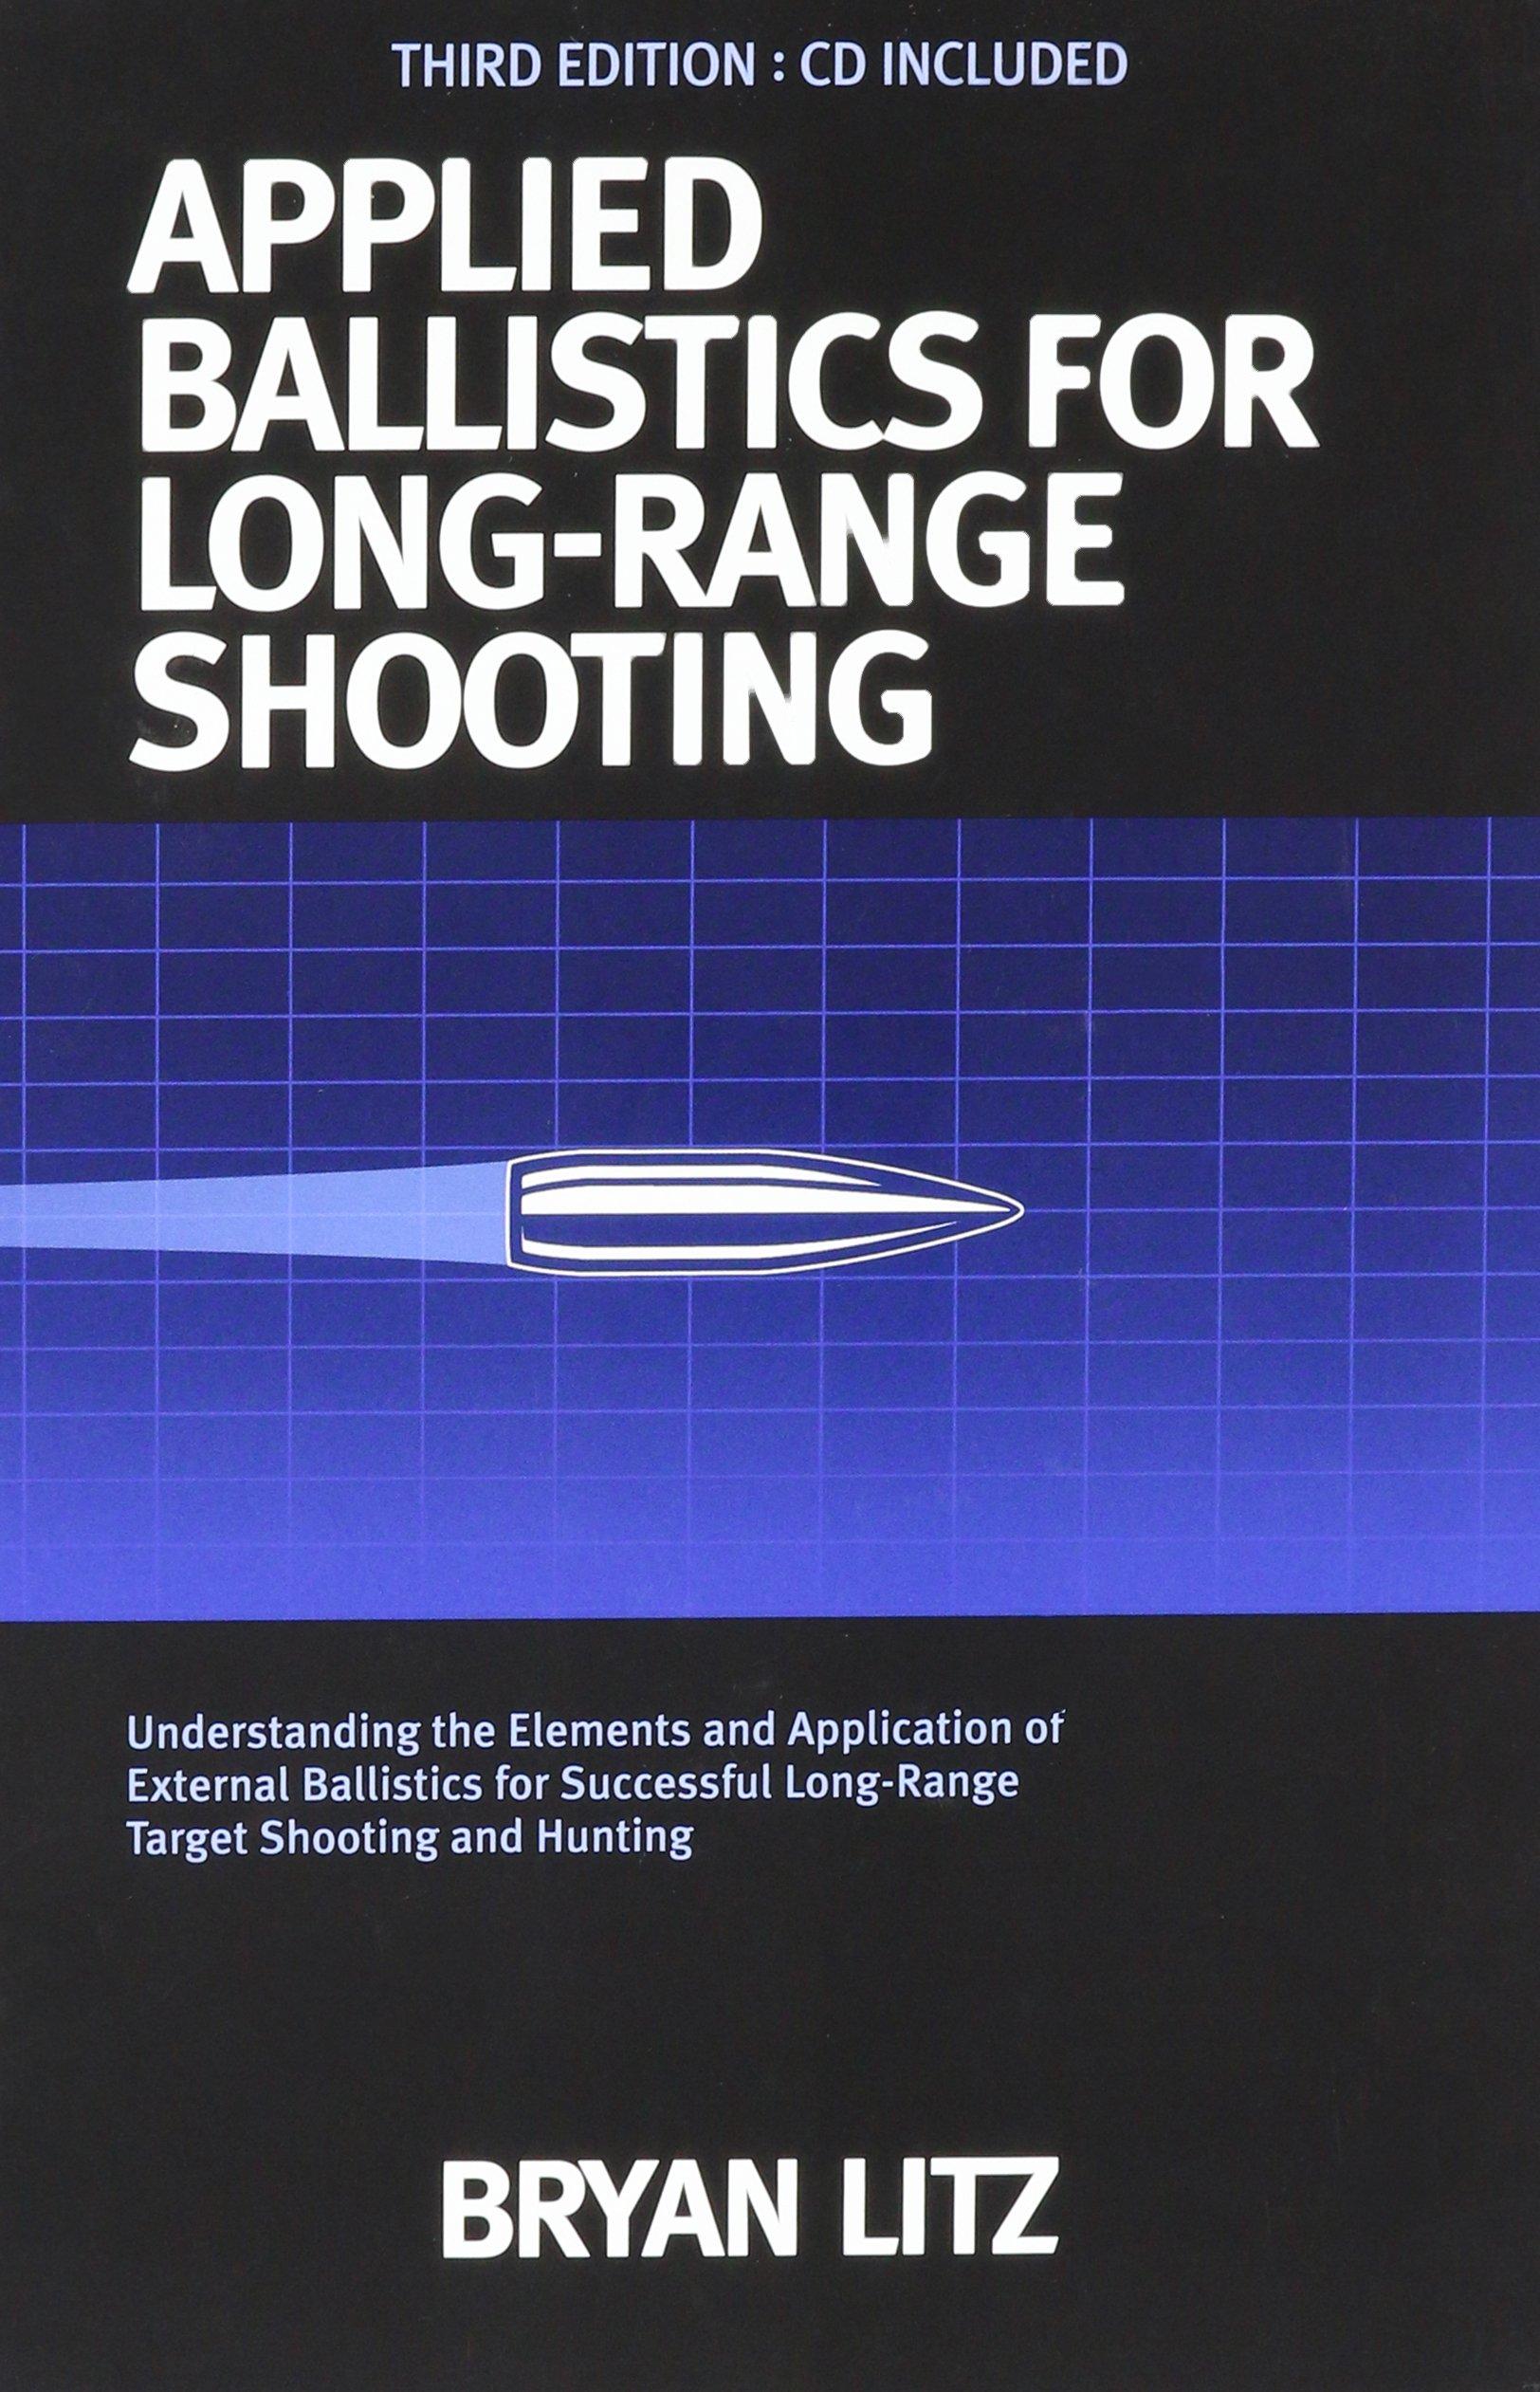 LONG RANGE SHOOTING NOTEBOOK EPUB